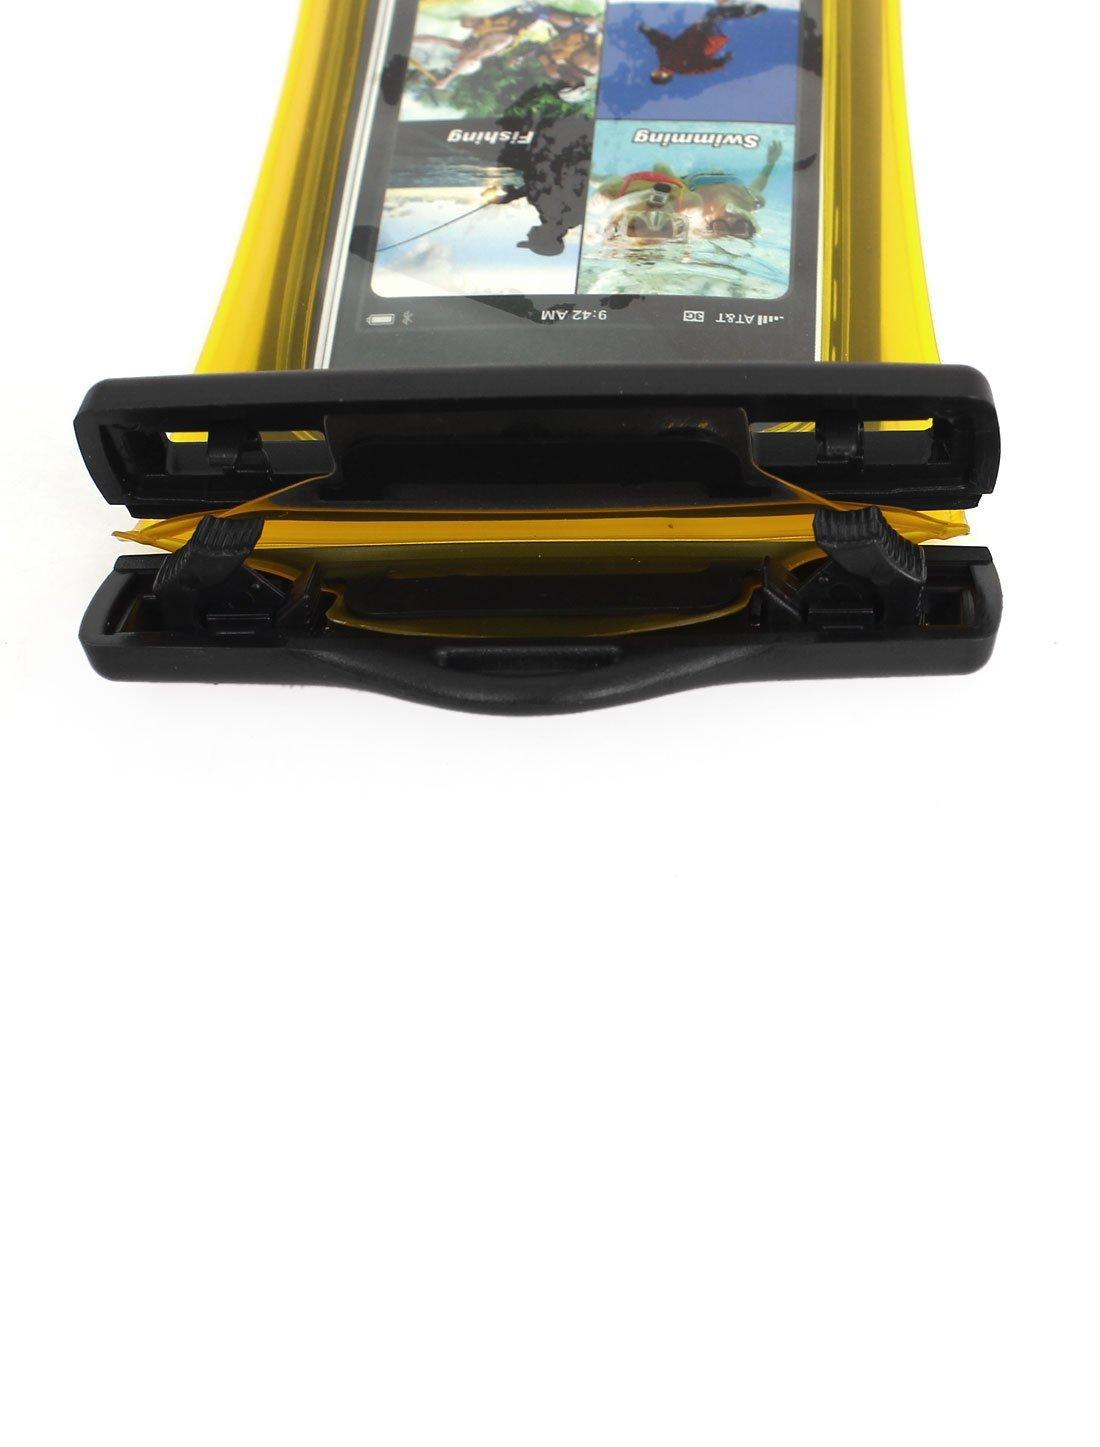 Amazon.com : eDealMax Teléfono celular impermeable del bolso seco Protector cubierta de la caja Amarillo claro : Sports & Outdoors